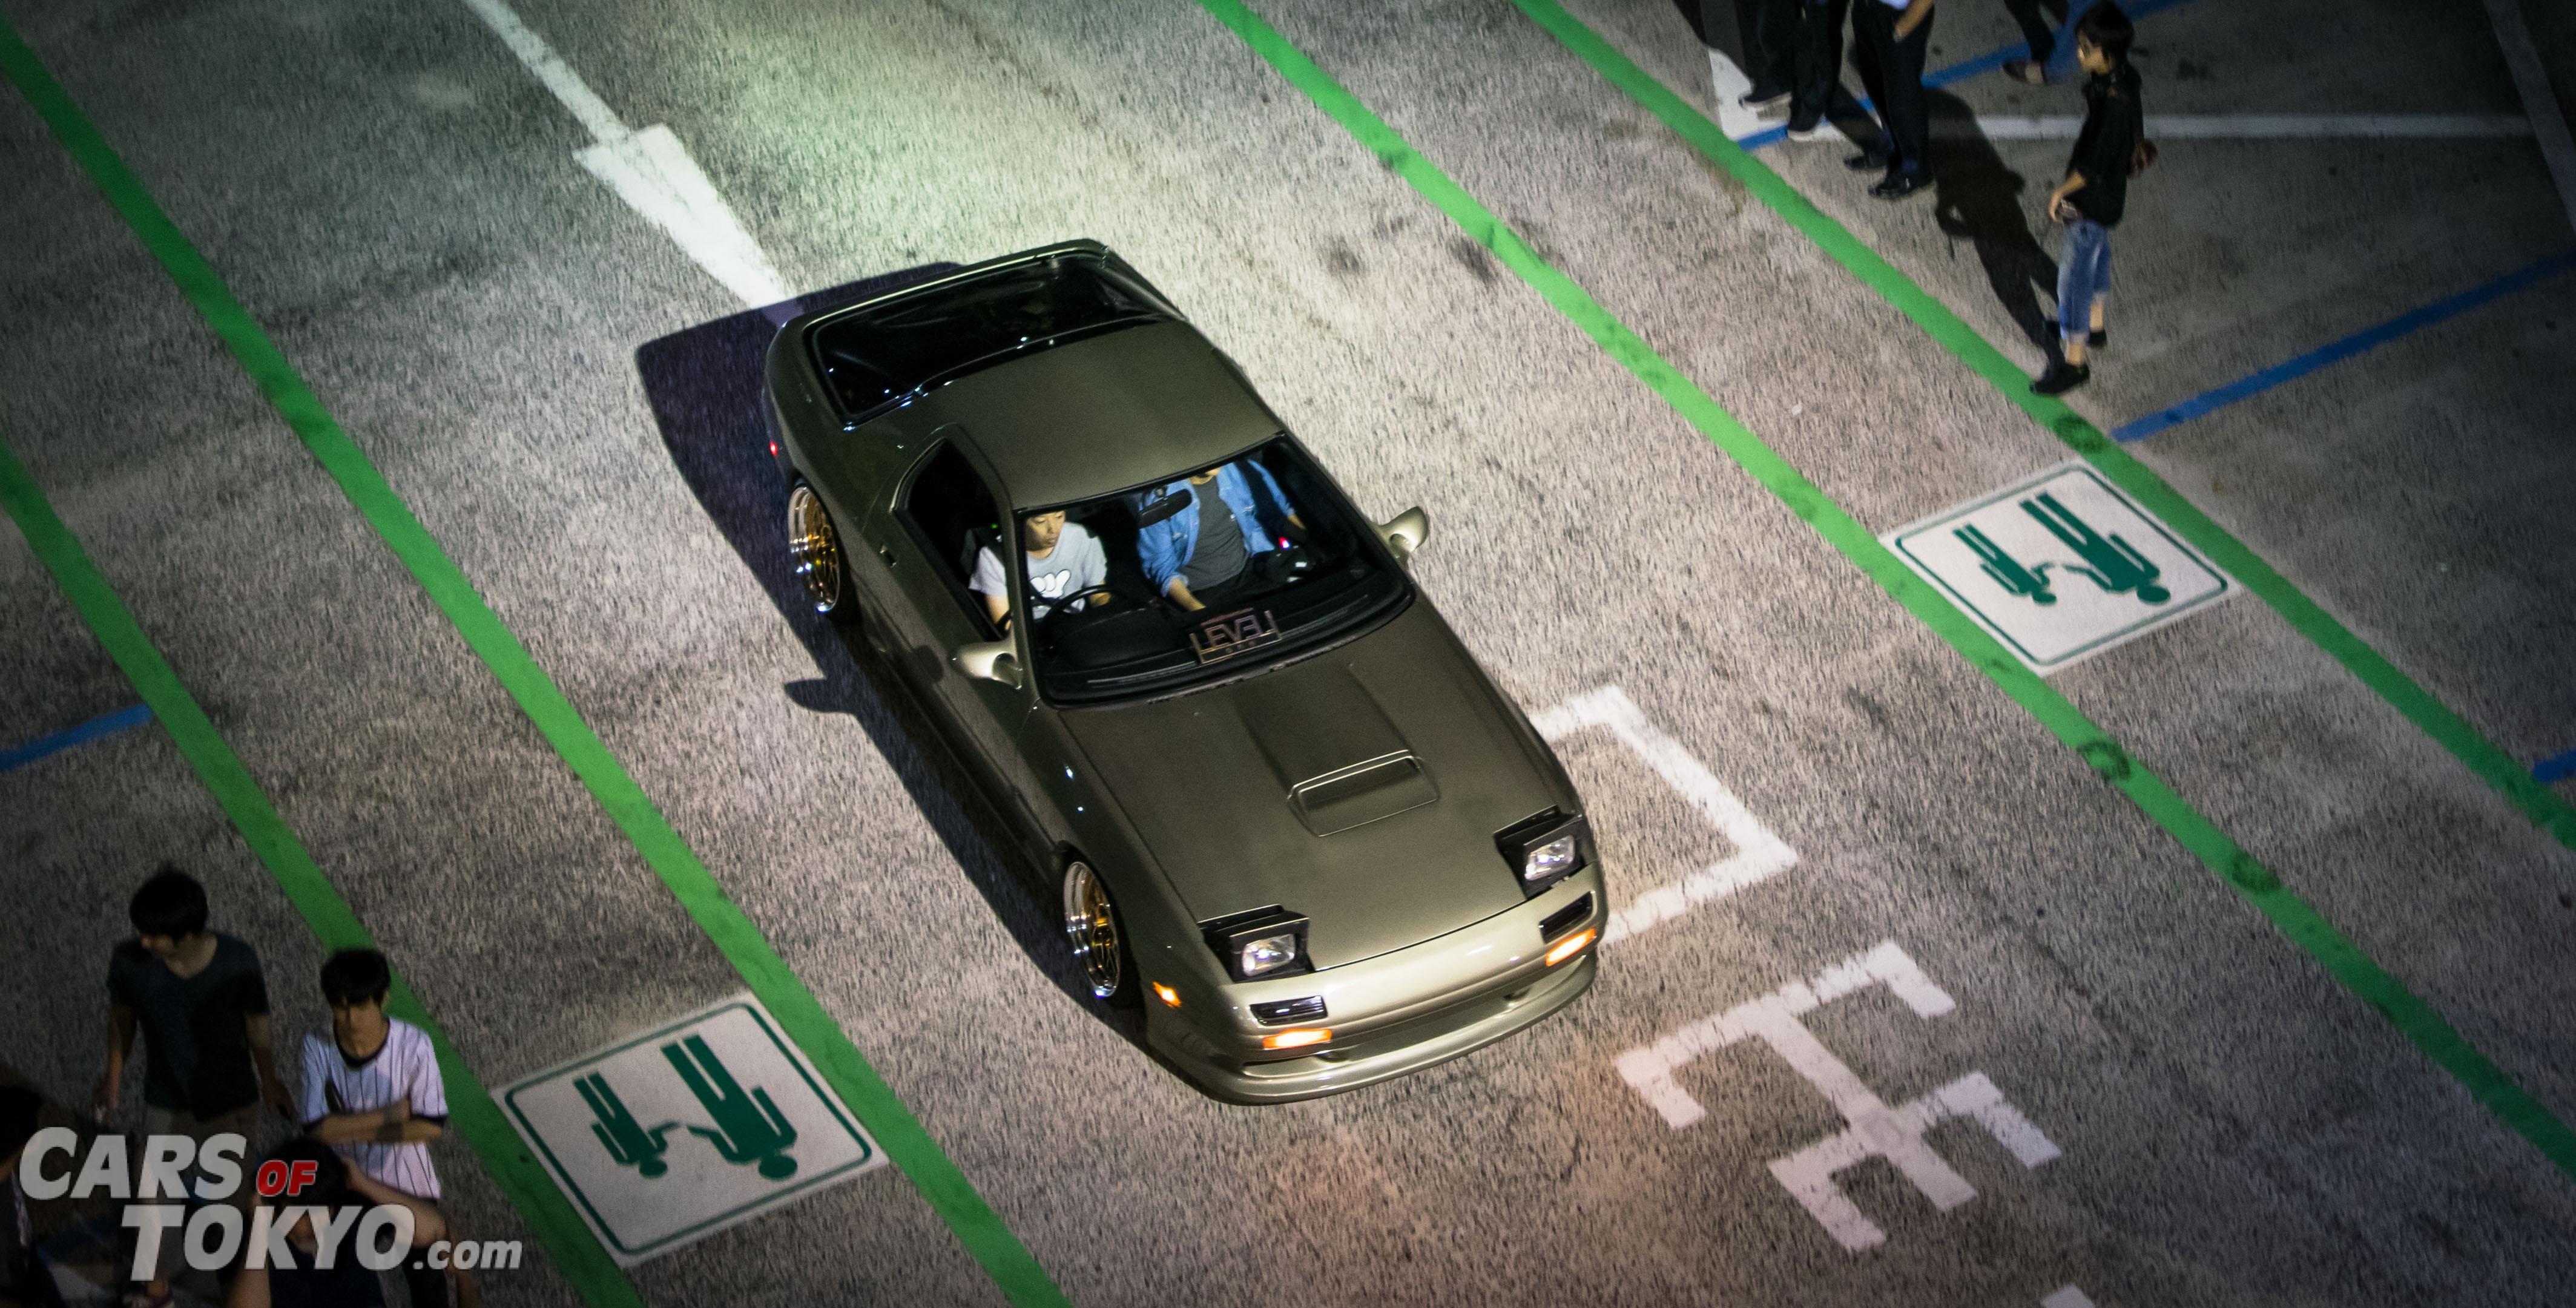 Cars of Tokyo Mazda RX7 FC